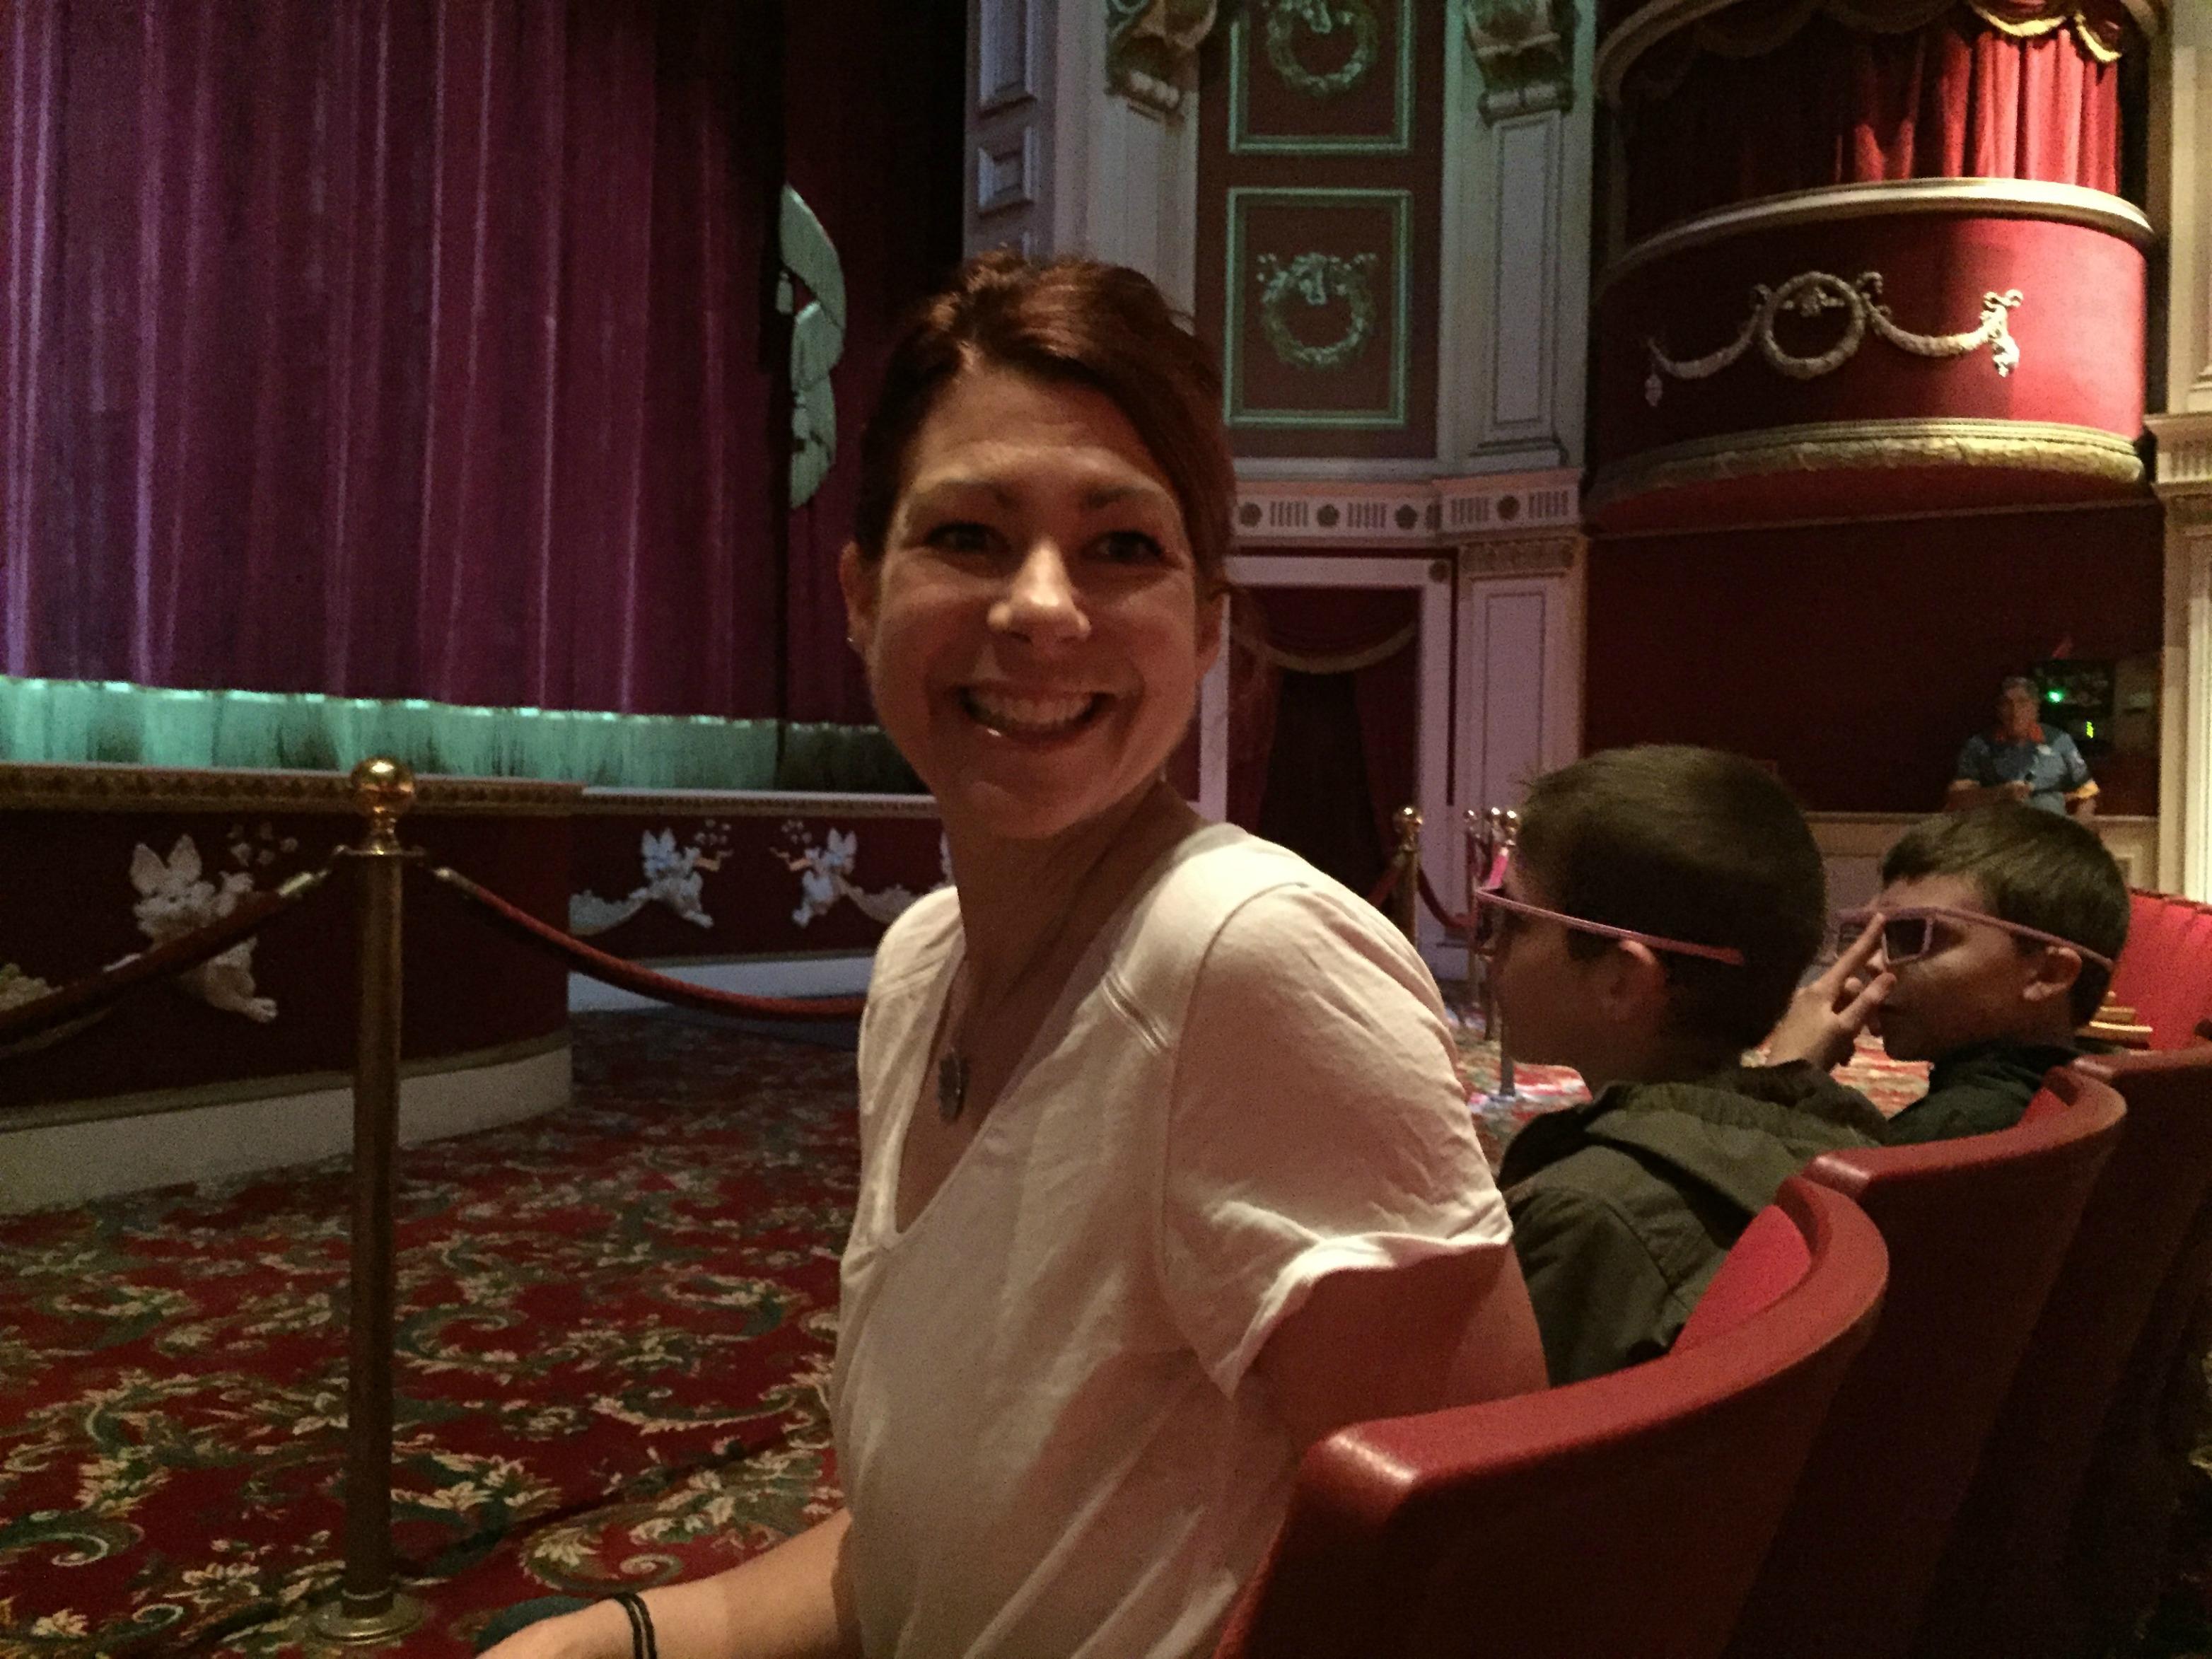 Muppet Theatre